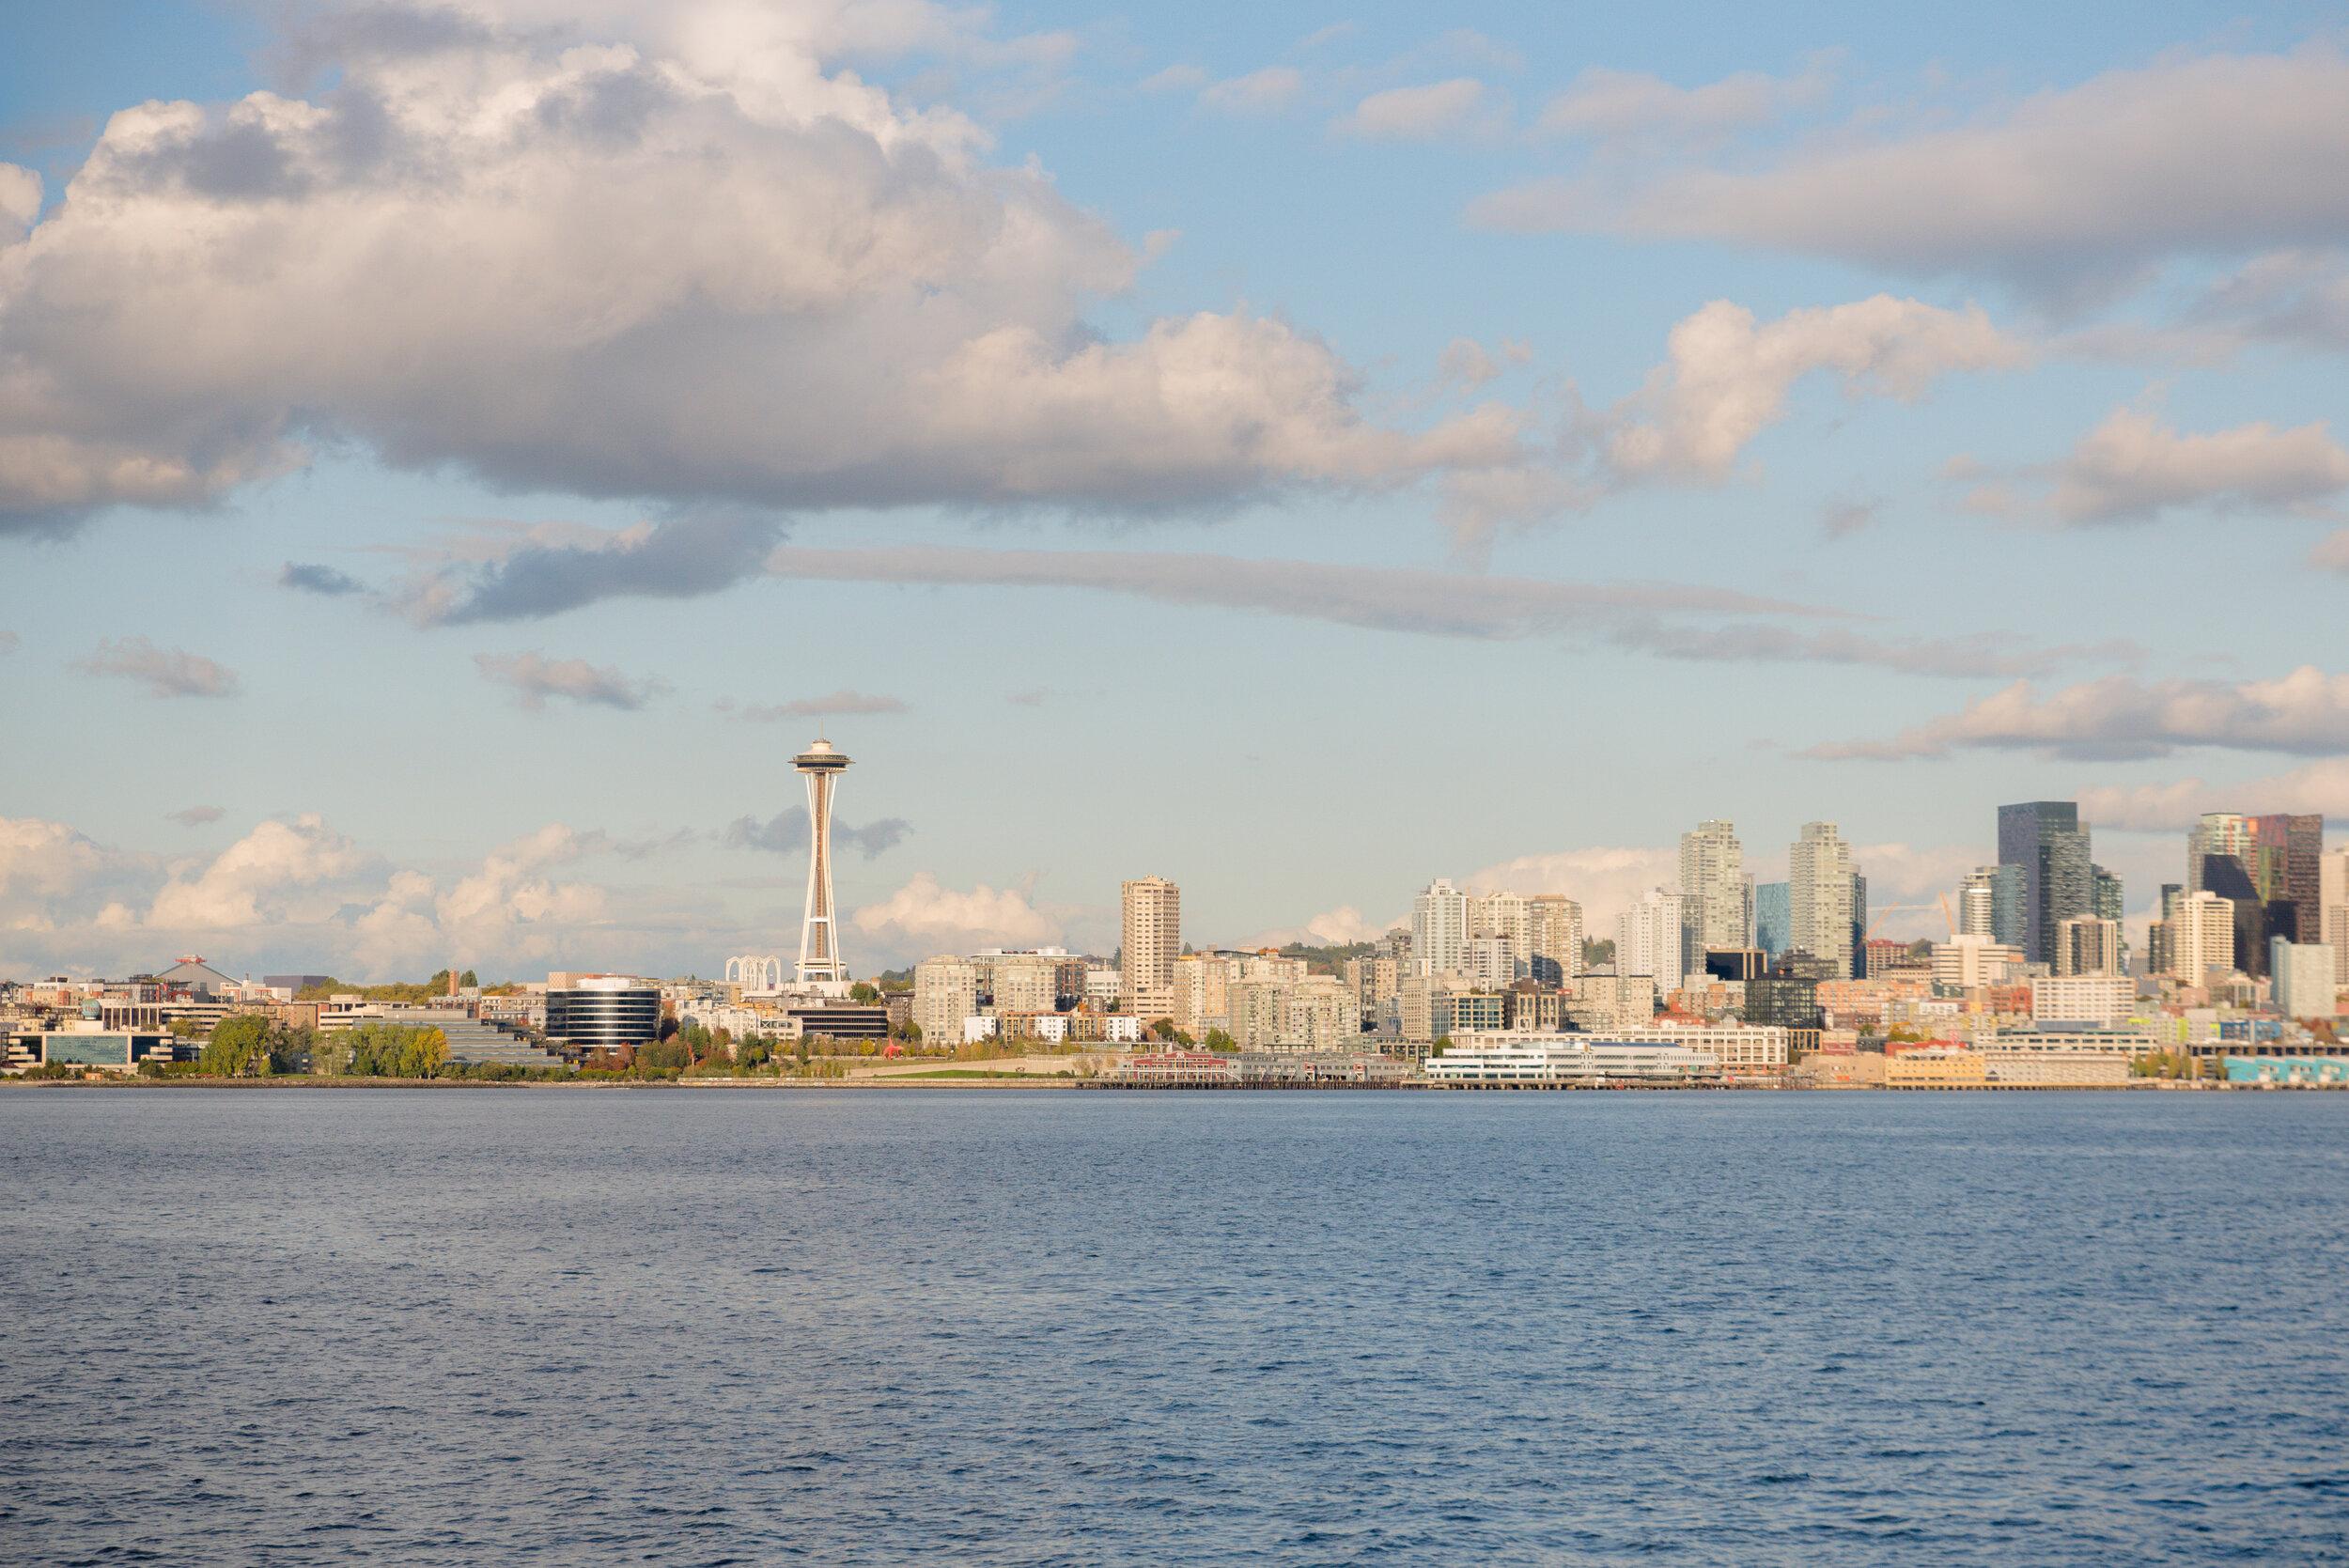 HPNGlobalPartnerConference104_KelliPricePhotography_SeattleWAOctober19.jpg